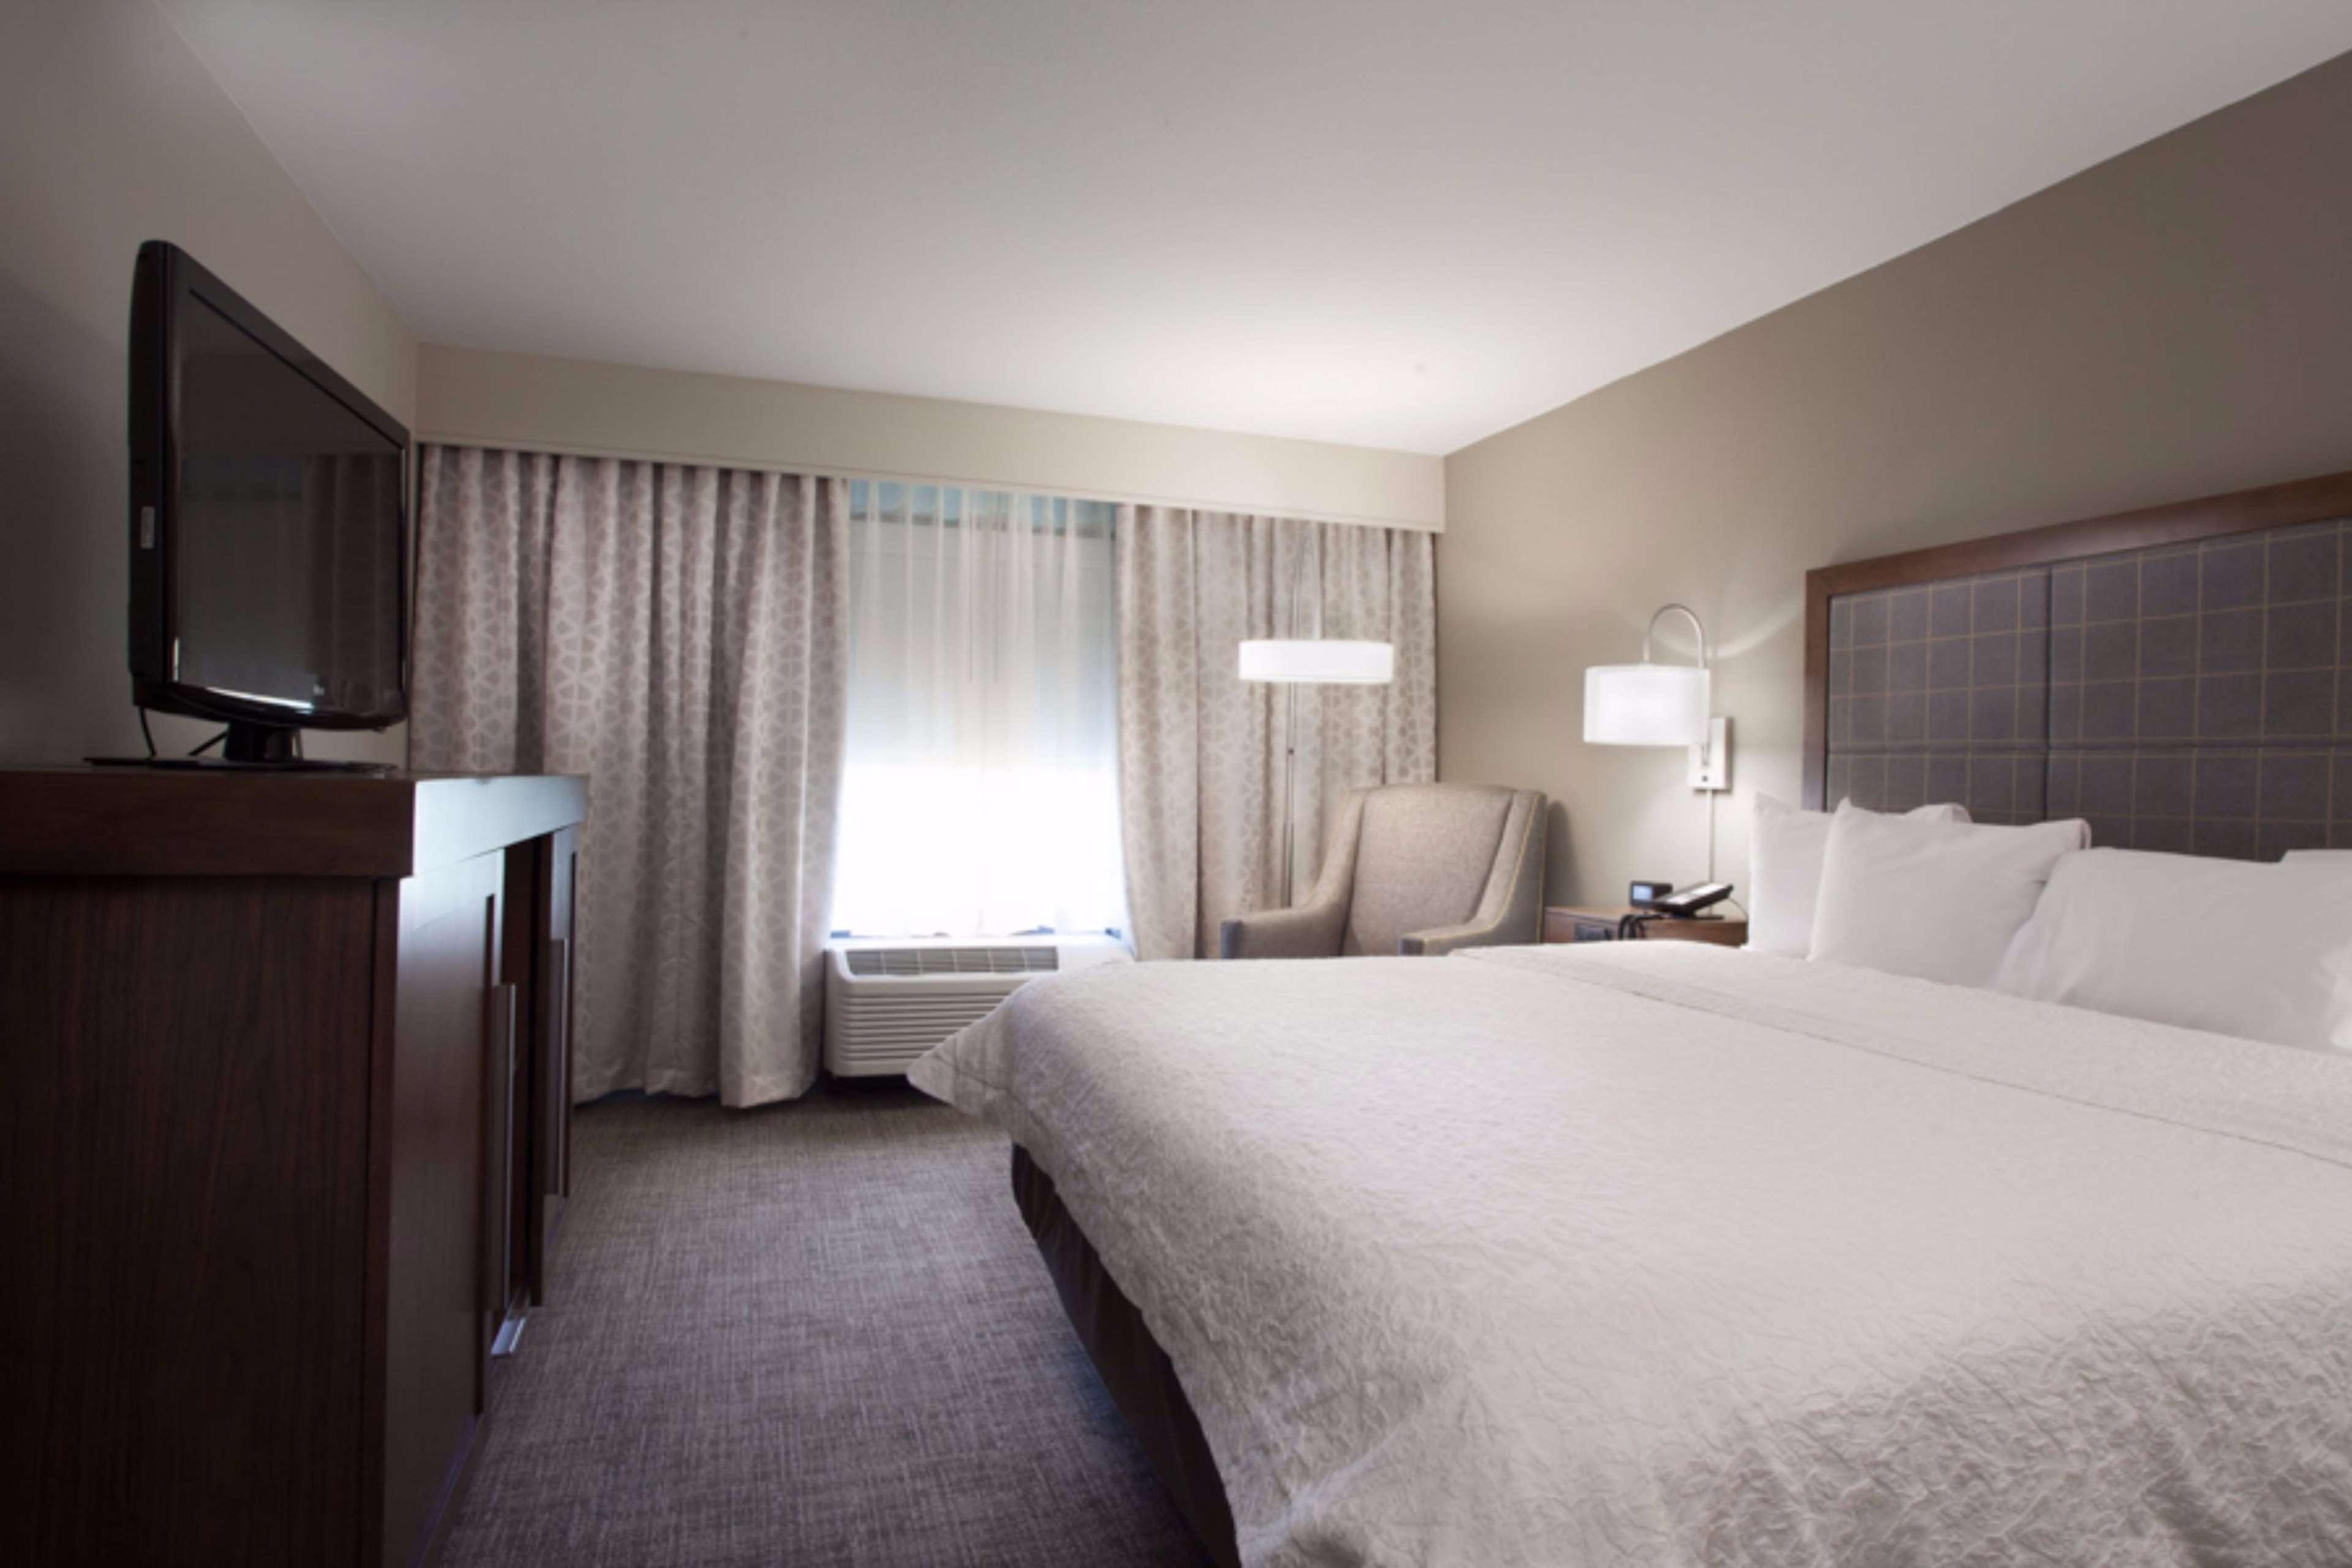 Hampton Inn & Suites Dallas-DFW Airport North-Grapevine image 18